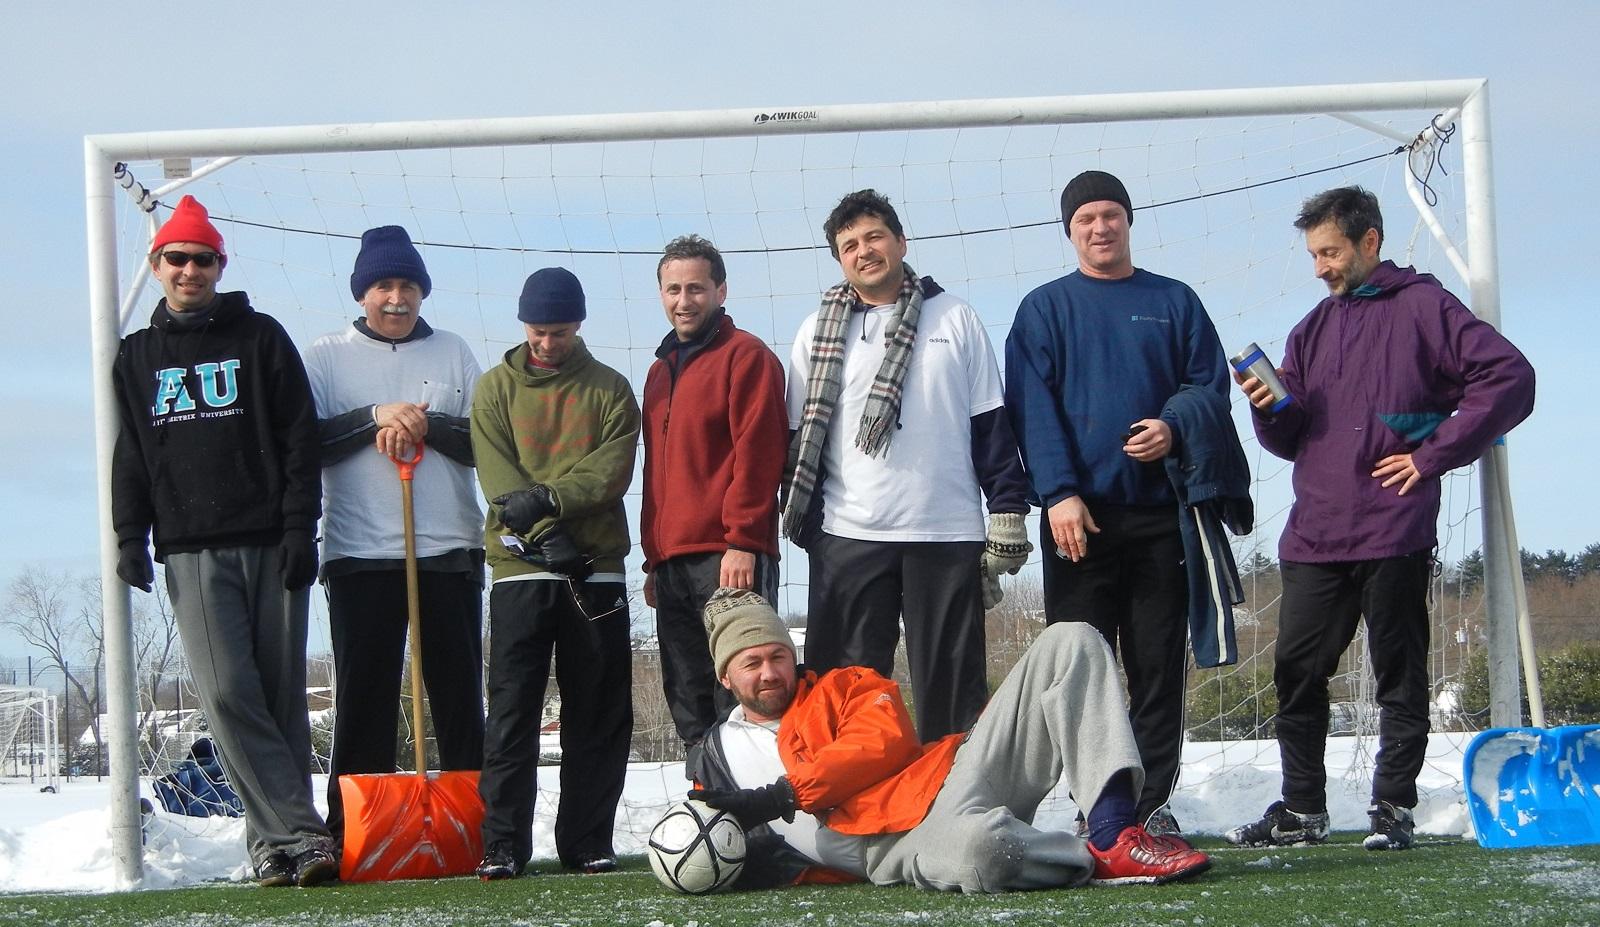 VMAC 2012-01-22 Waltham